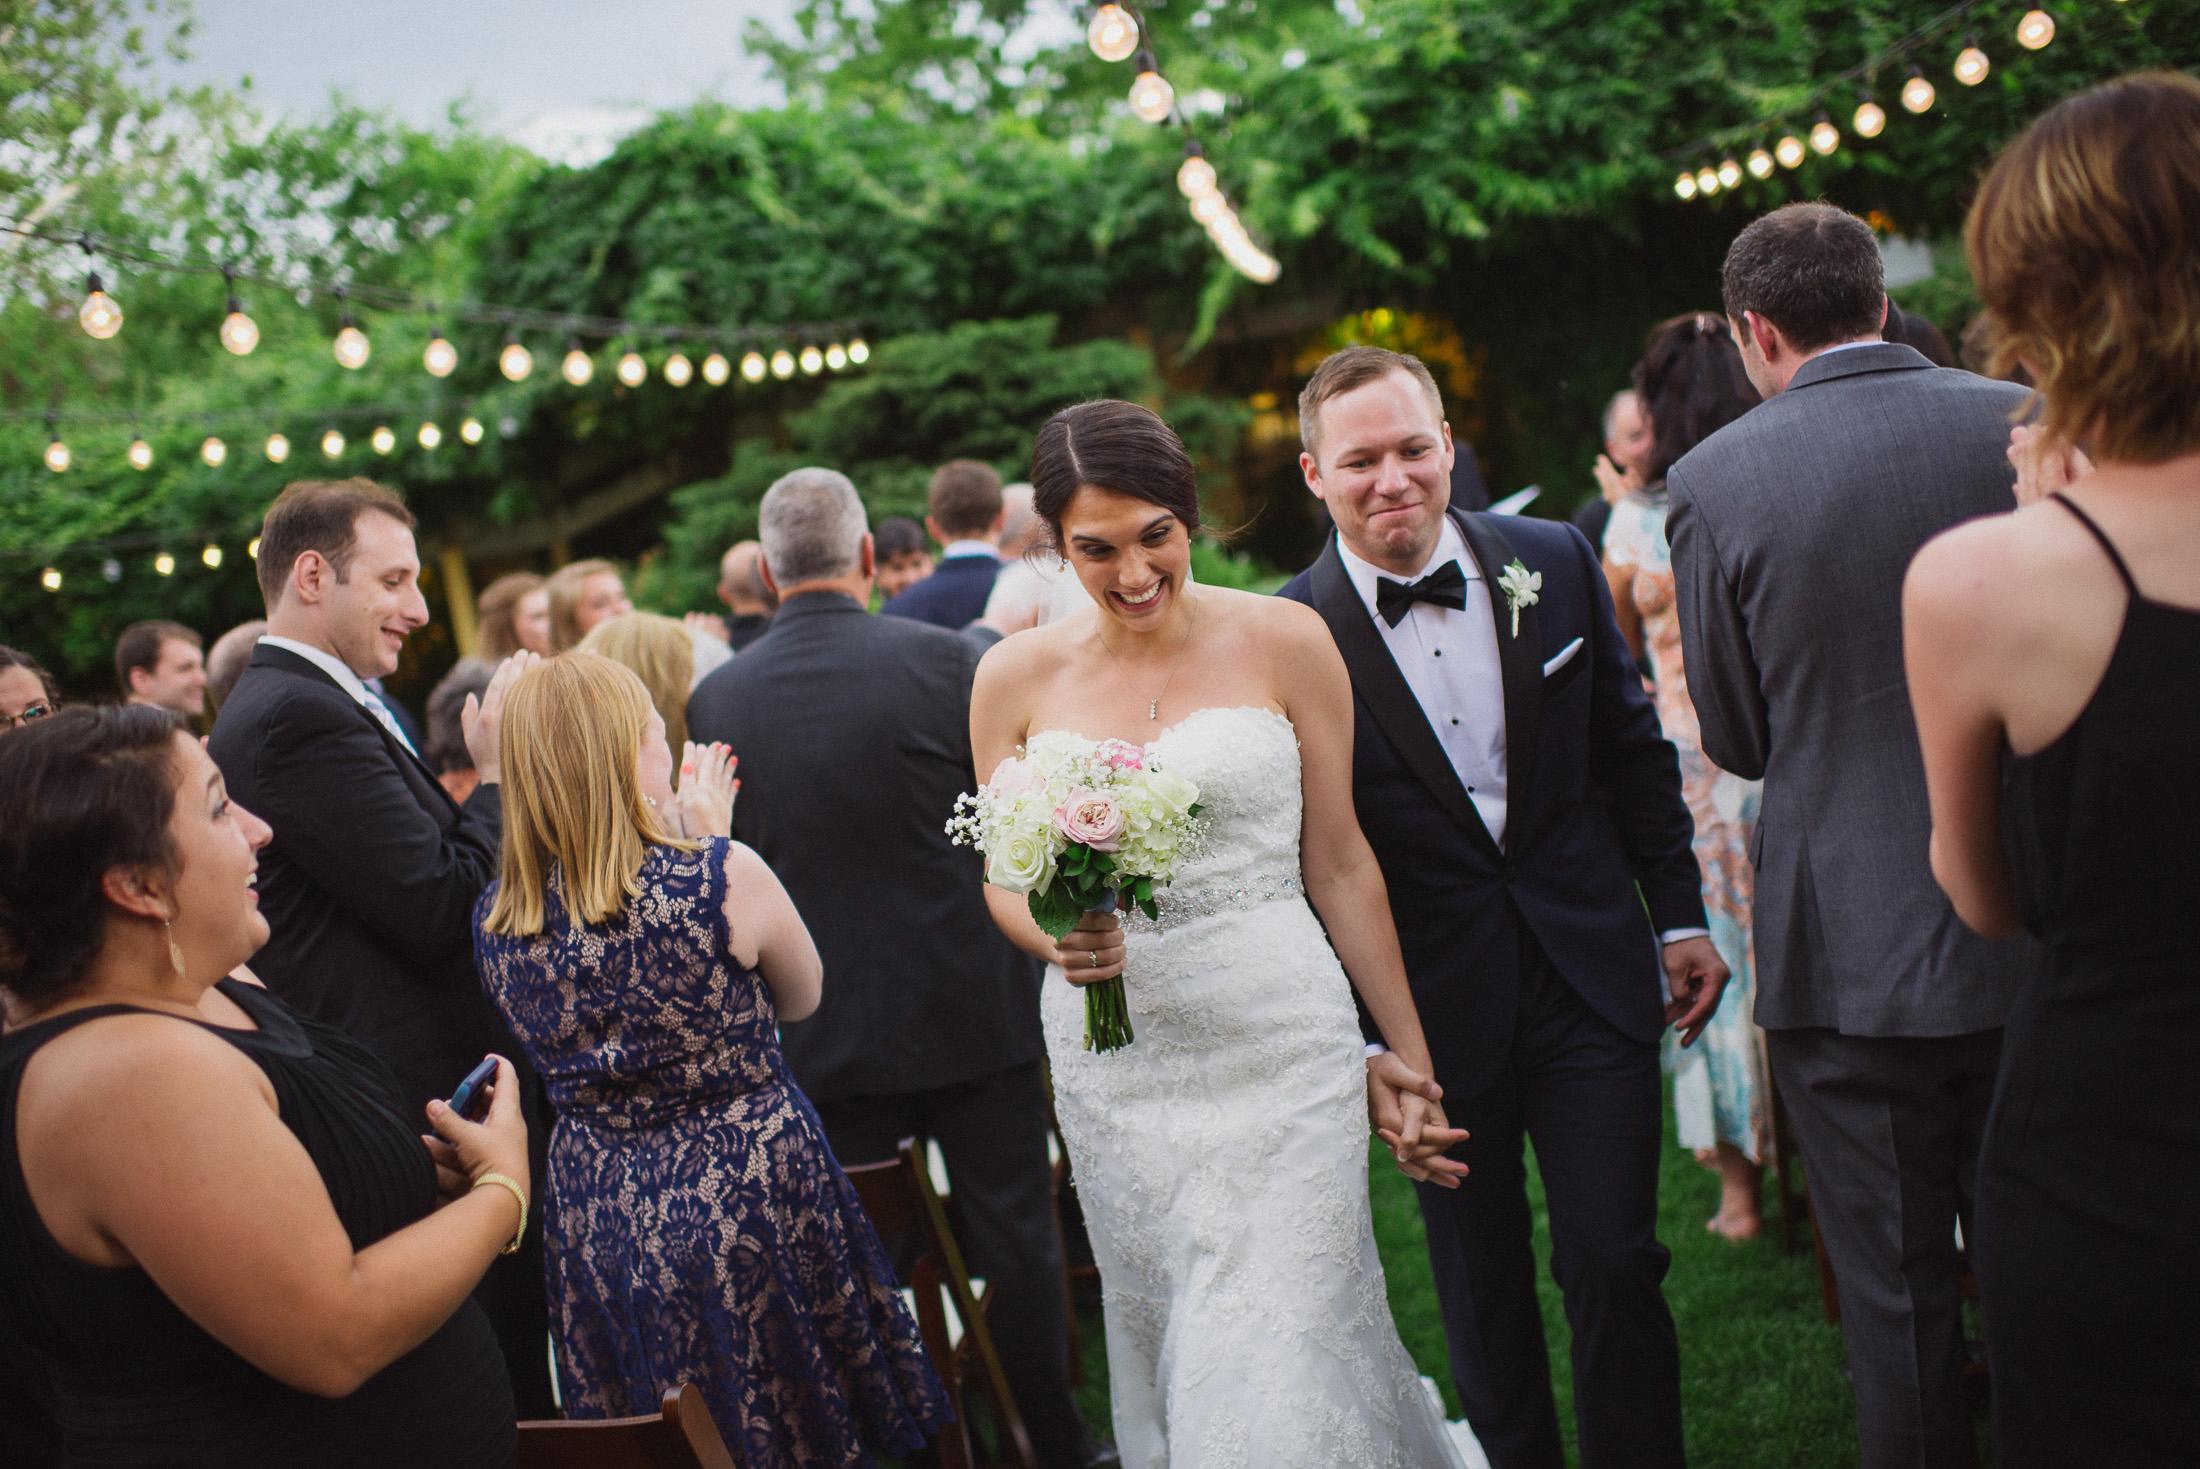 NH Wedding Photographer: recessional at BVI